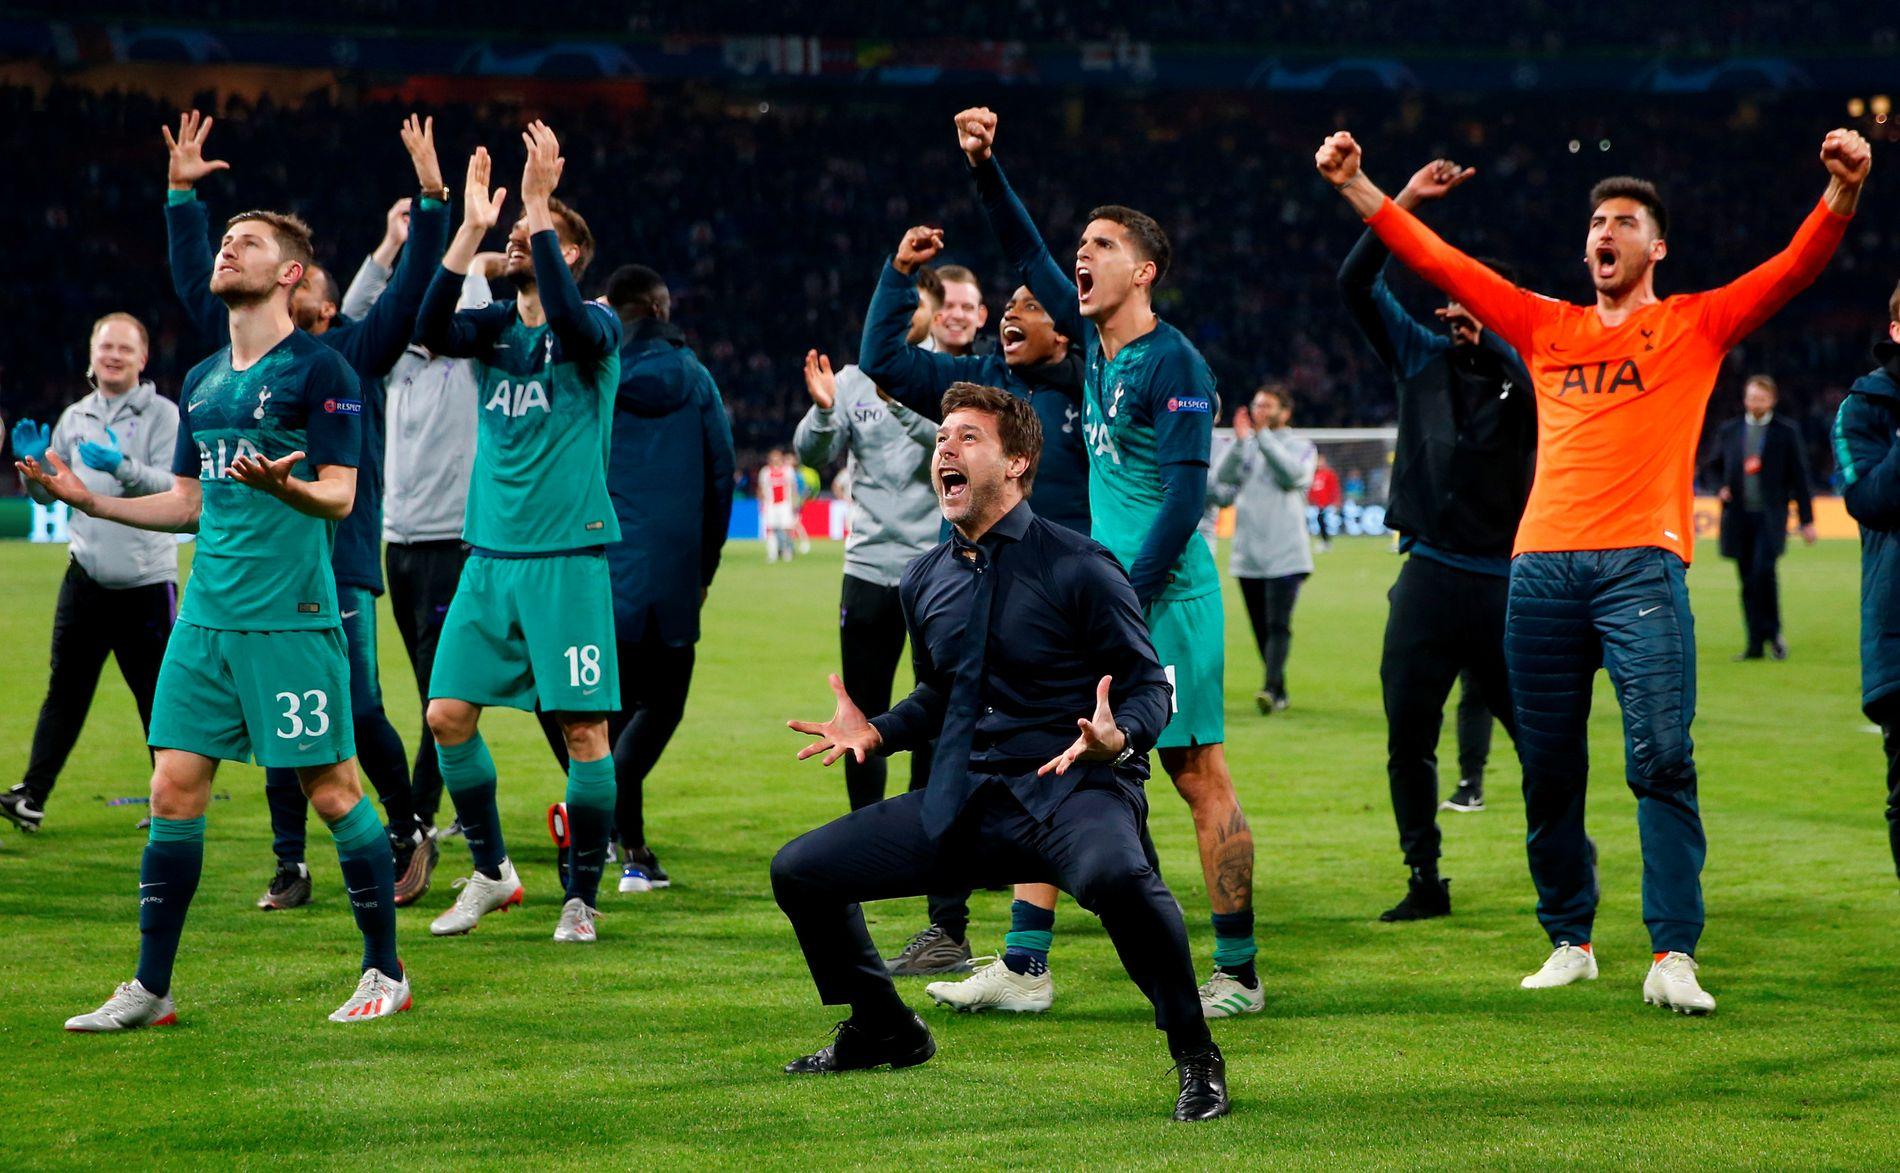 Mauricio Pochettino var sentral i de enorme jubelscenene etter Tottenhams triumf i Amsterdam.